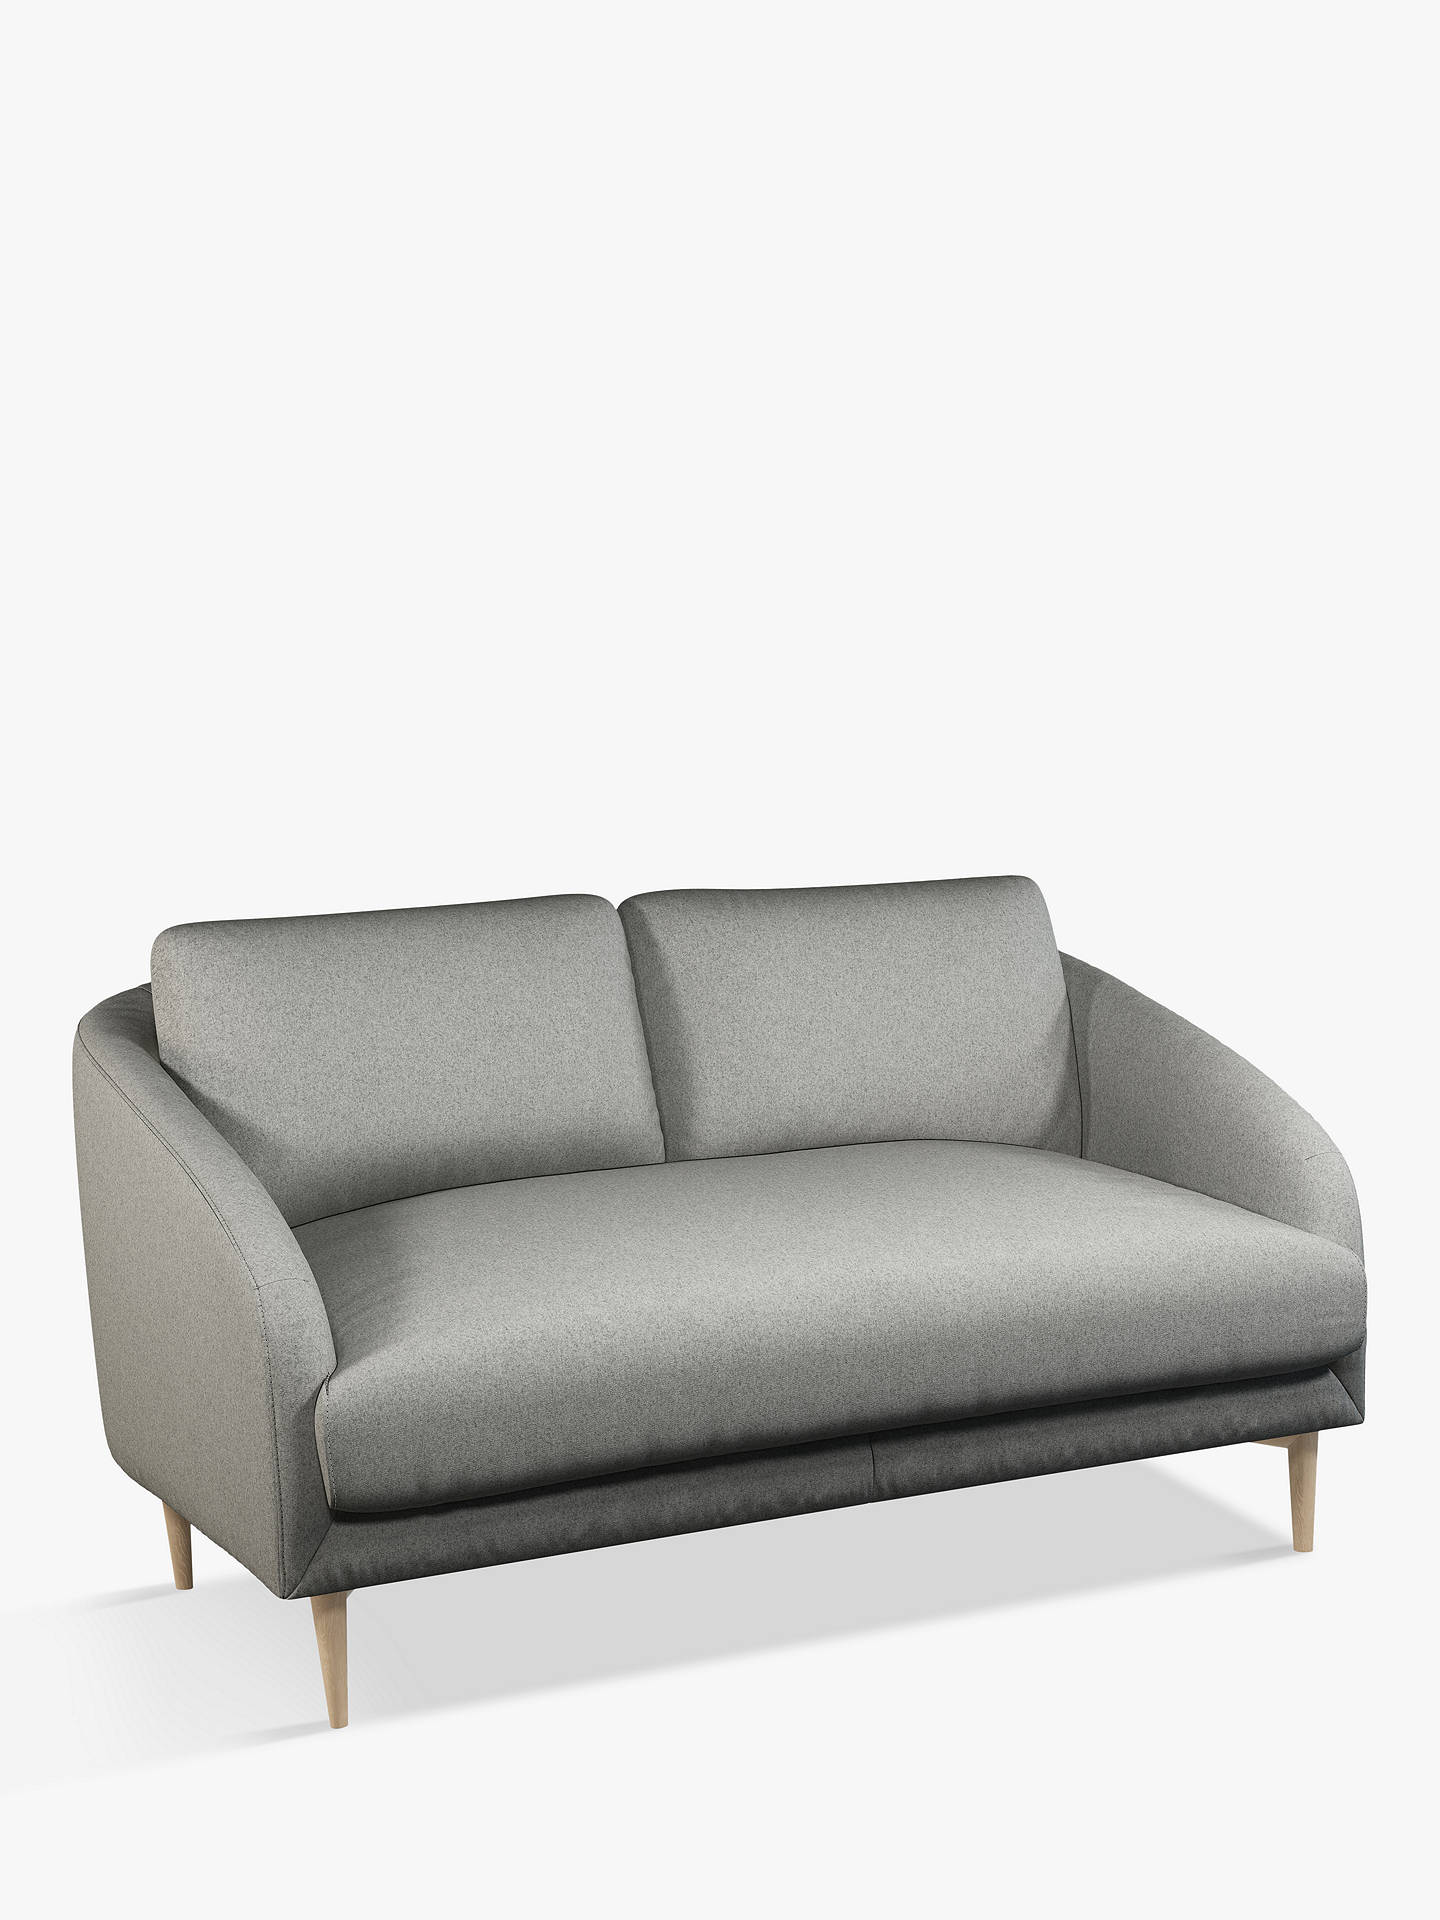 John Lewis Partners Cape Small 2 Seater Sofa